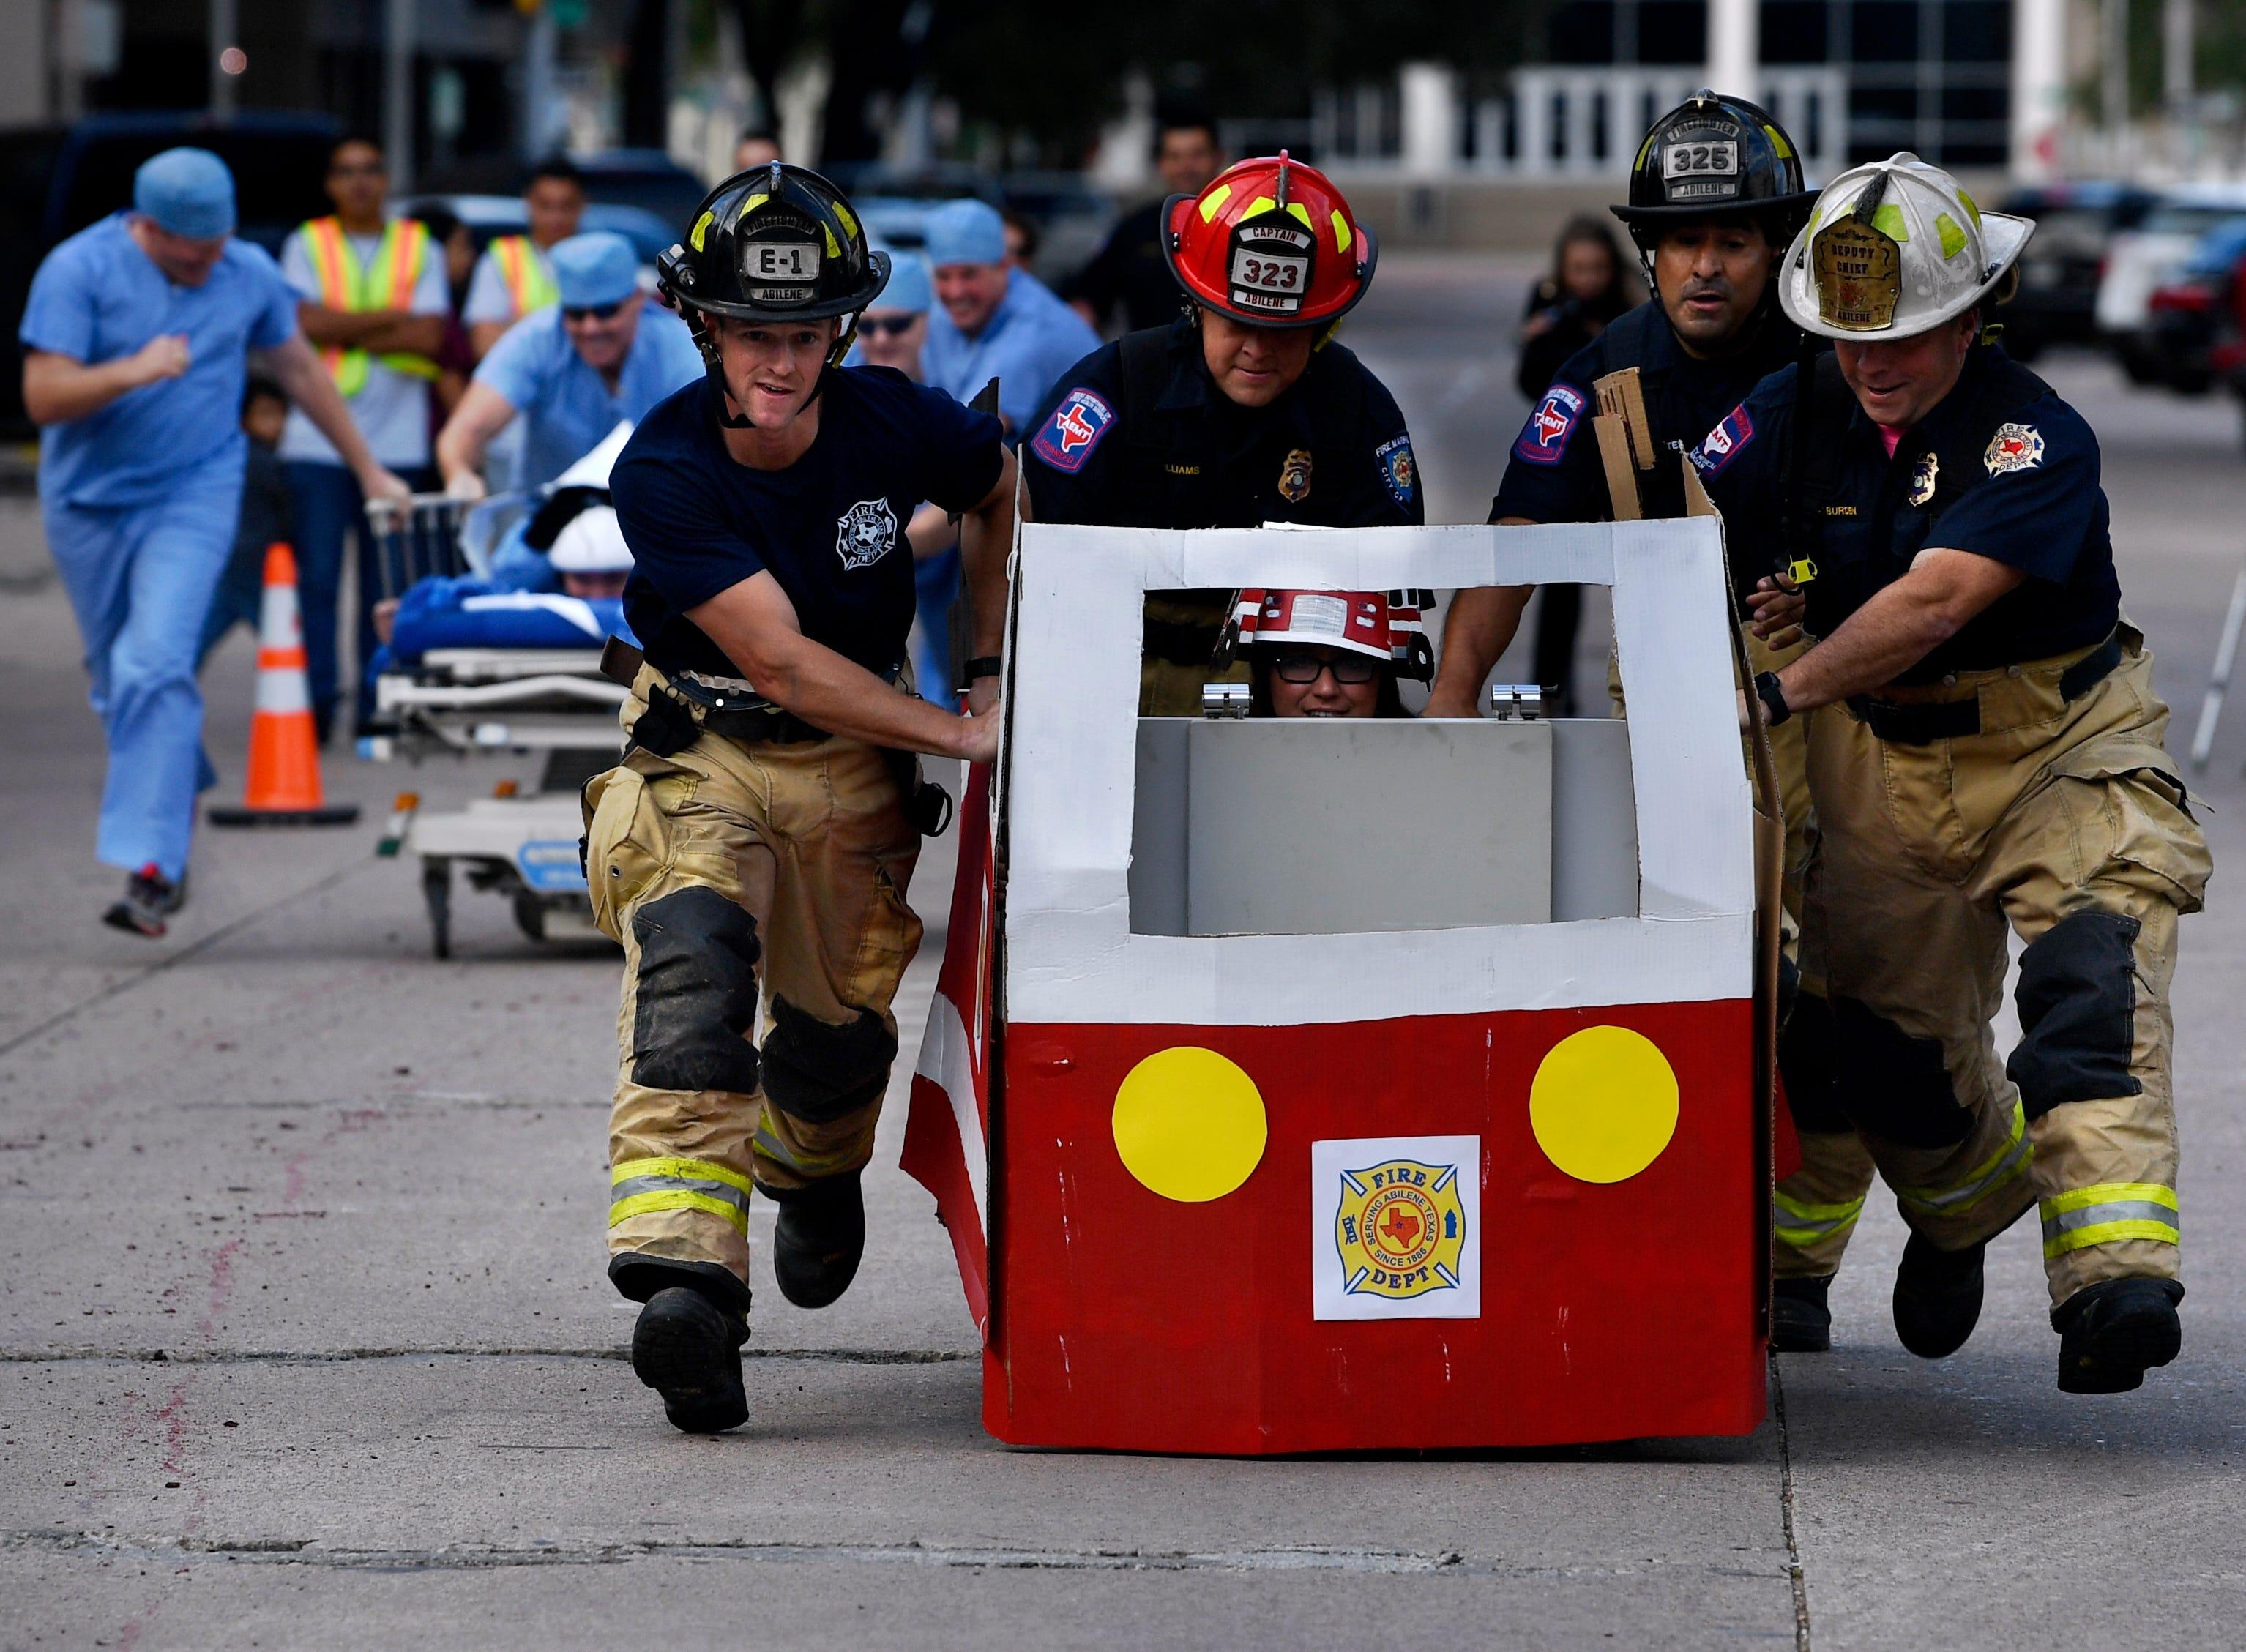 The Abilene Fire Department gurney is leading during The Great Gurney Race Thursday.